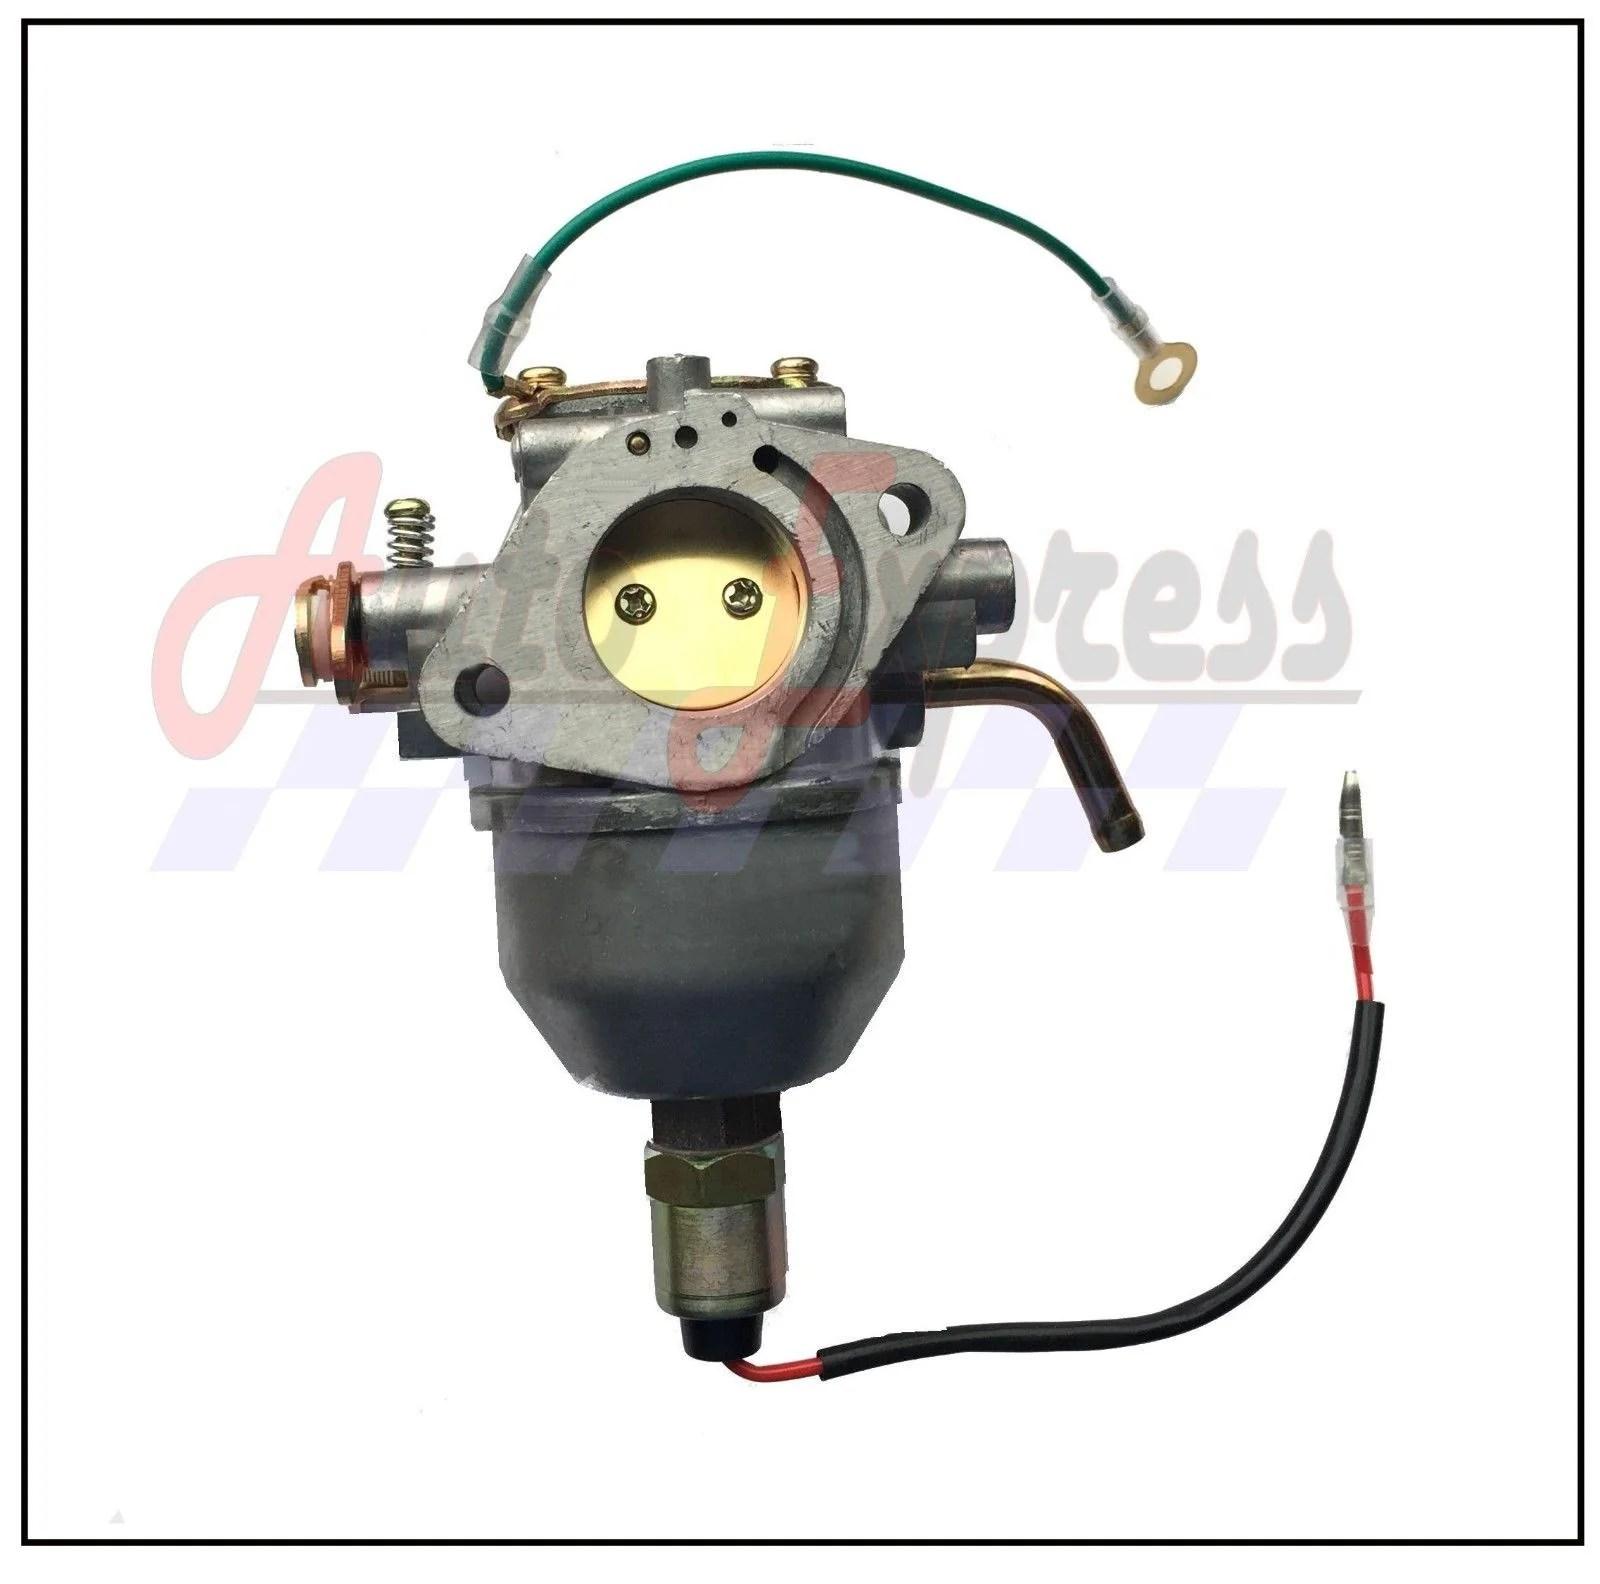 medium resolution of carburetor fits kohler cv740 cv745 engine carb oil fuel filter